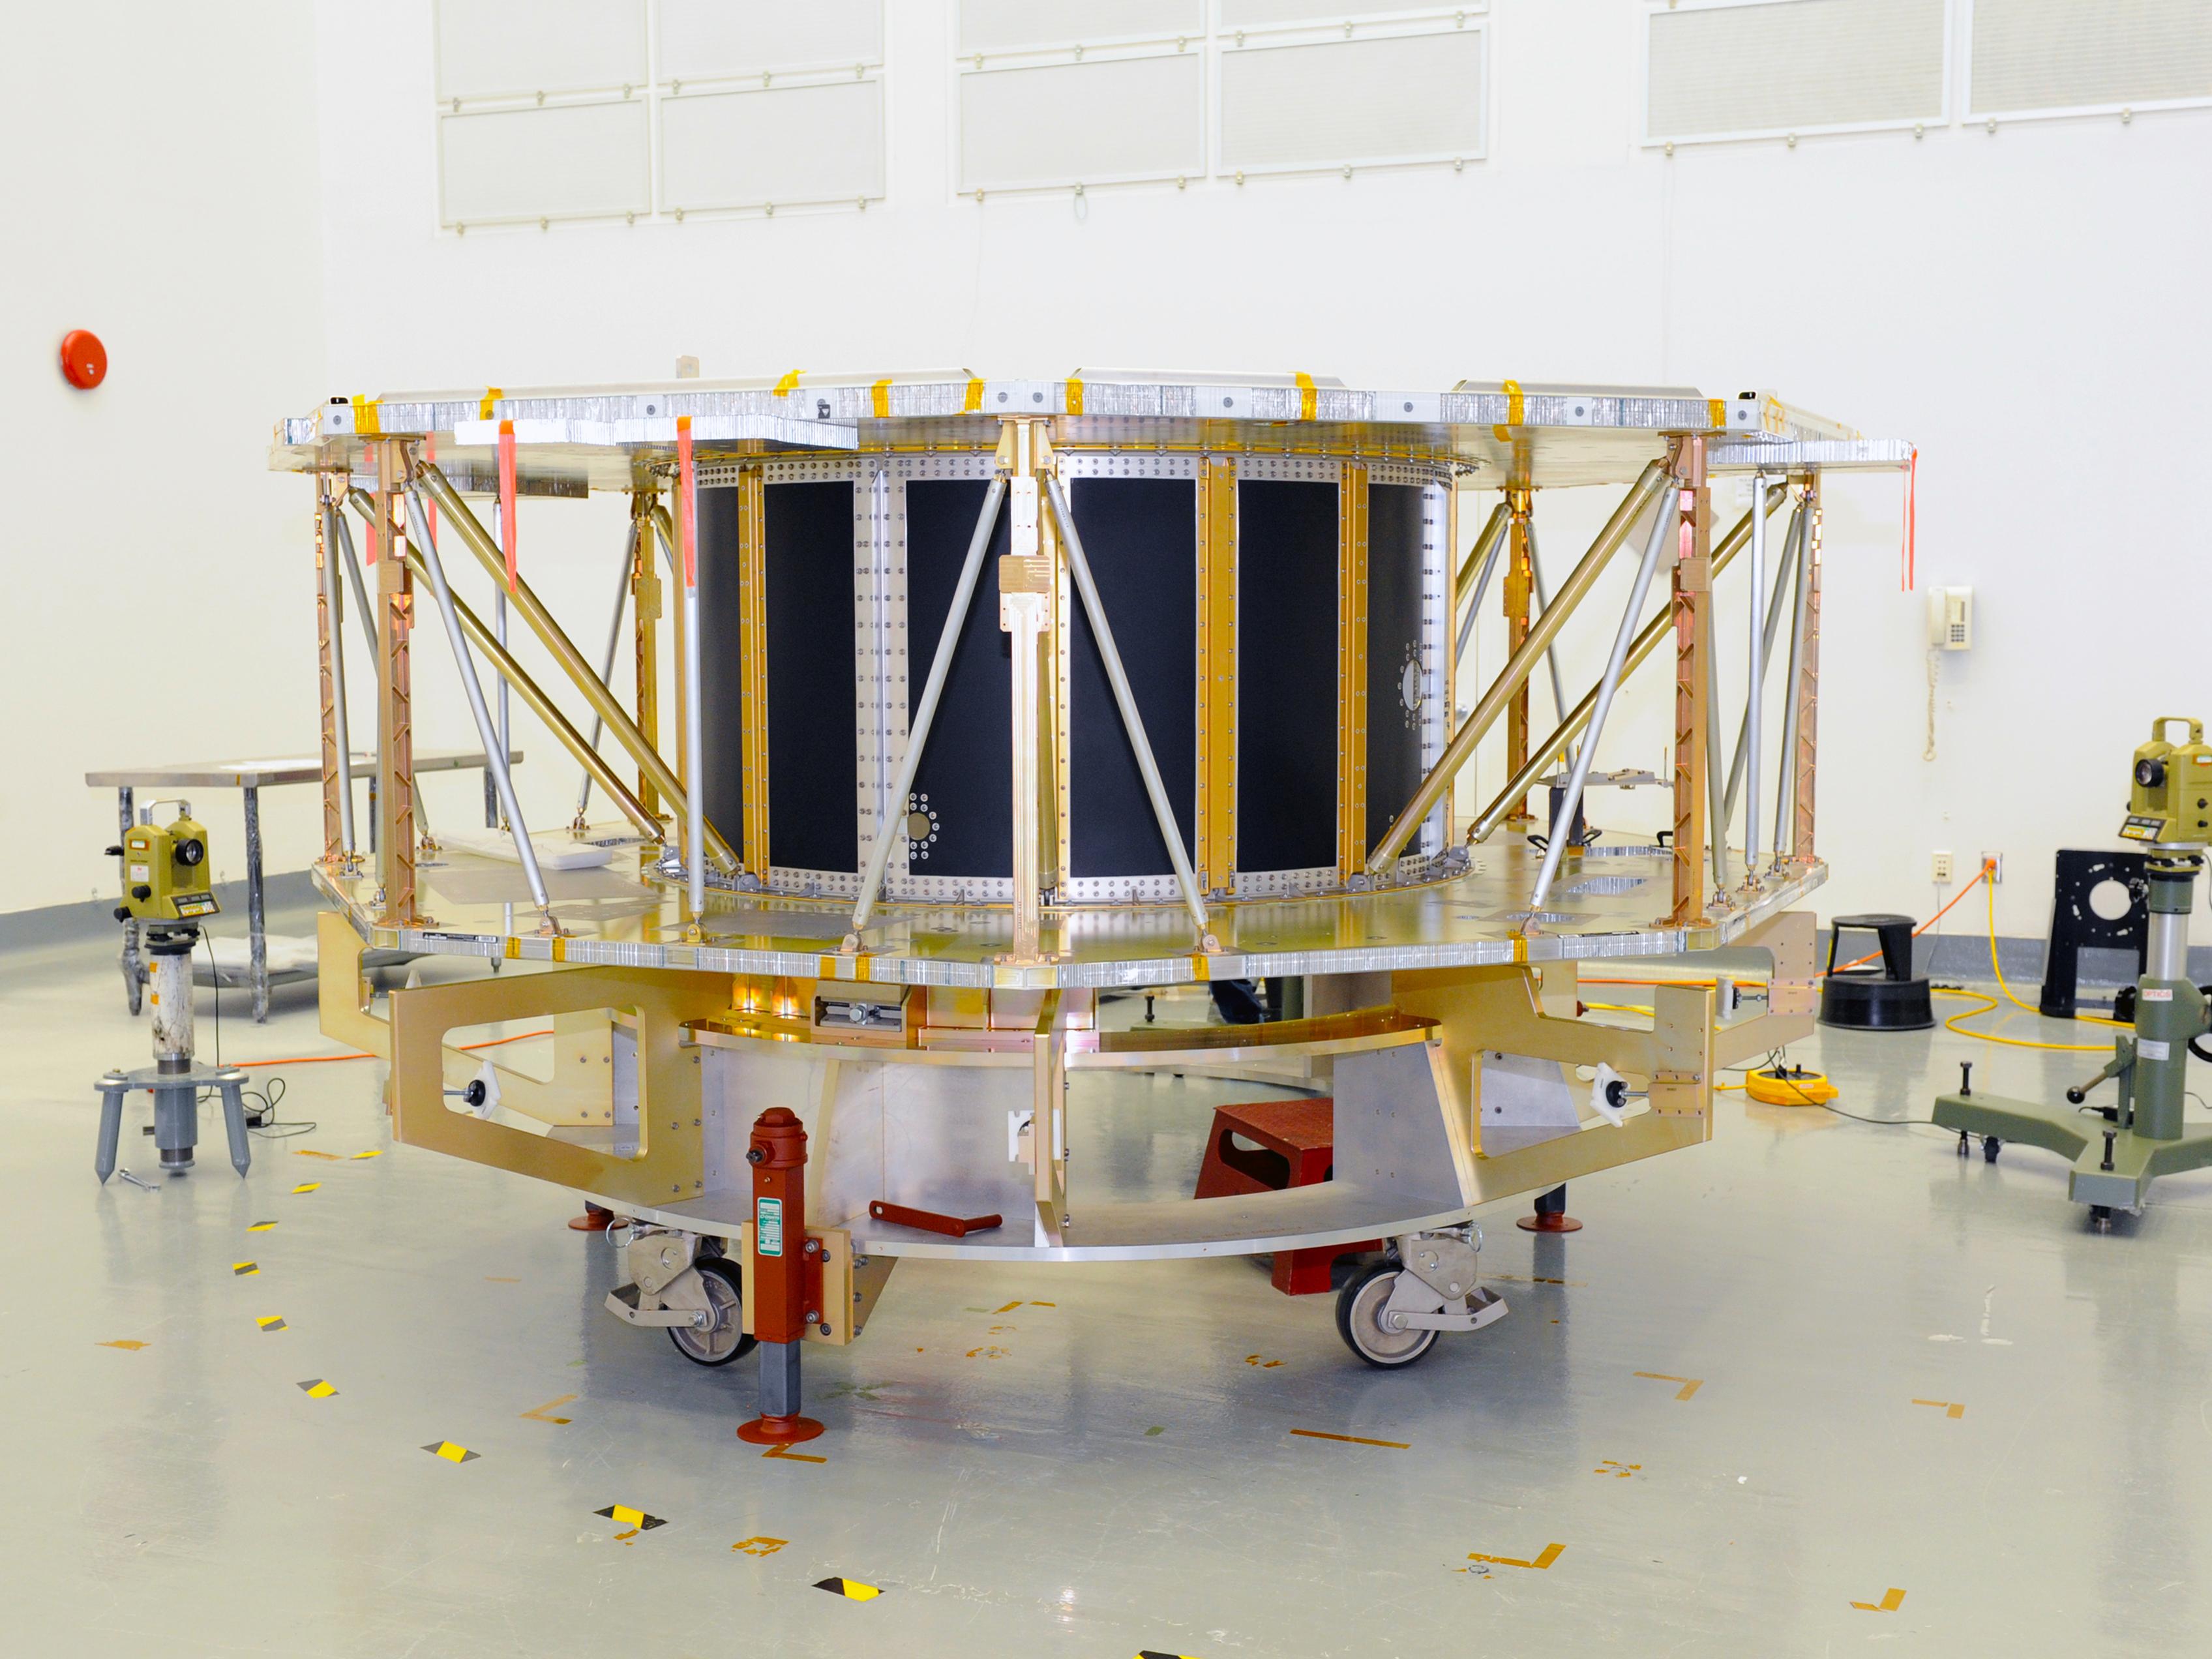 mms nasa spacecraft - photo #31